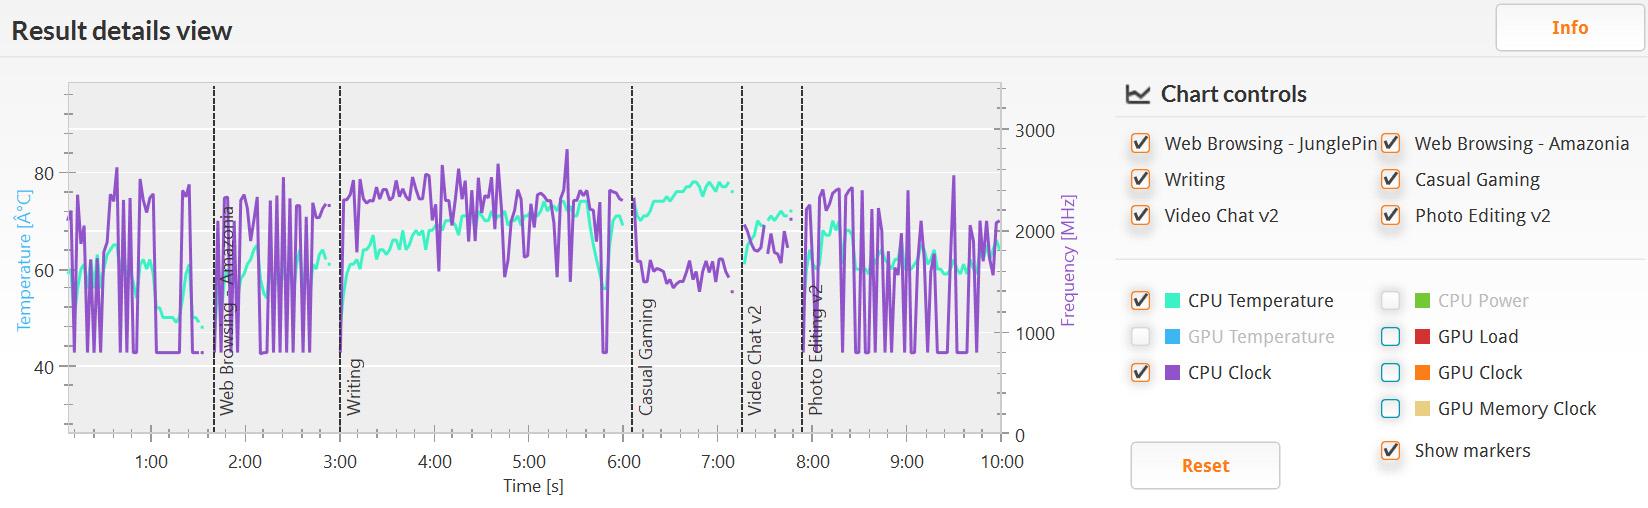 PCMark 8 バージョン2のHome(accelerated)/詳細。クロックは800MHz辺りから最大の2.4Hz。温度は約50℃から80℃近辺と結構幅がある